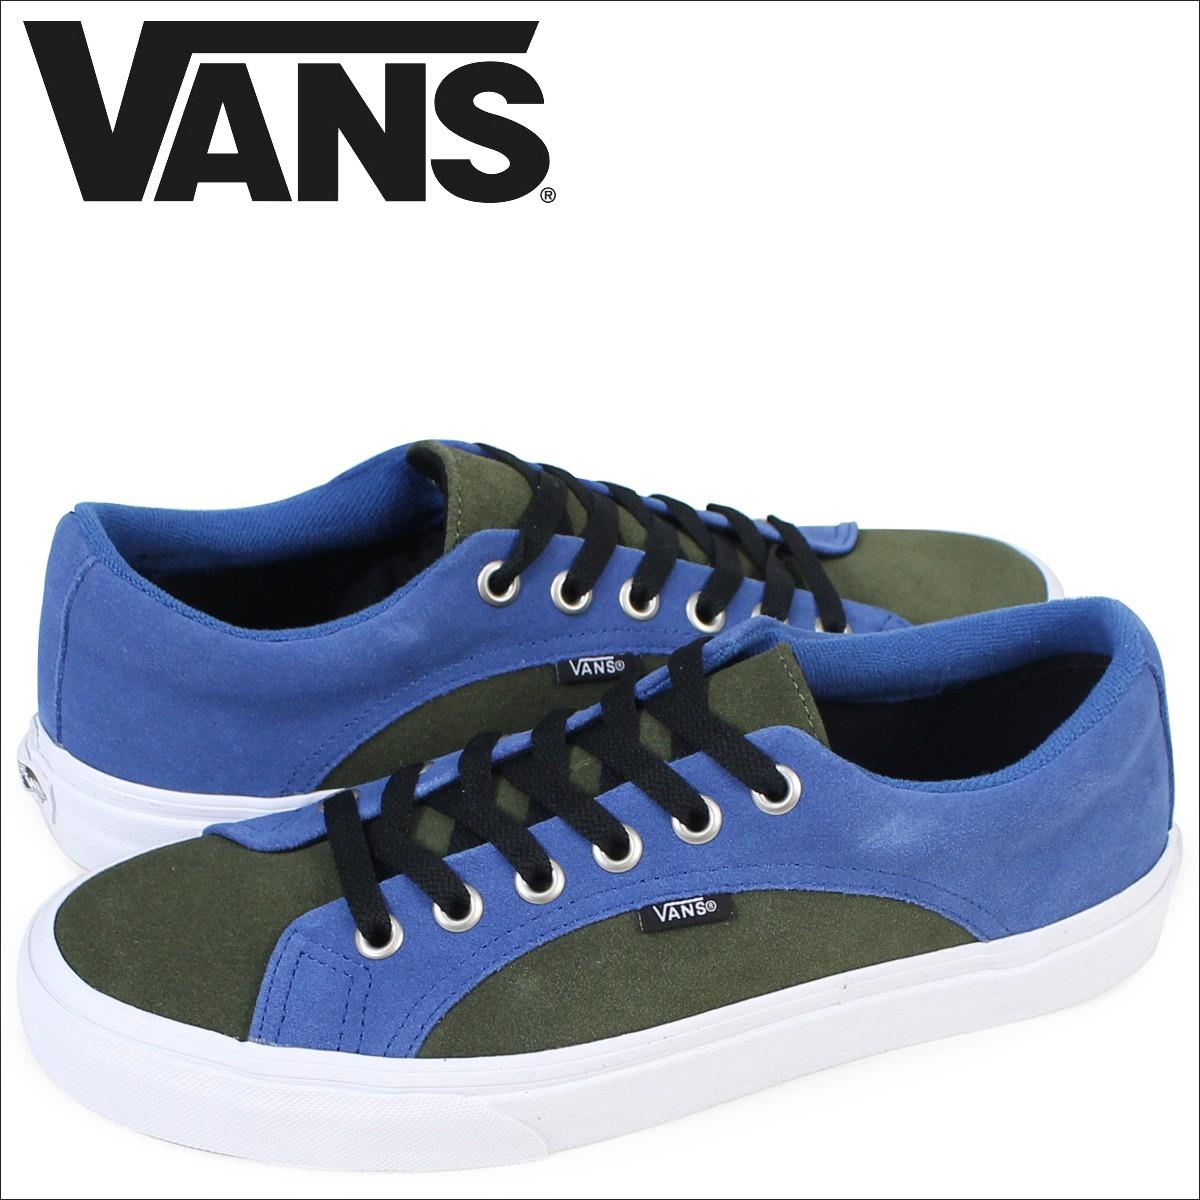 VANS ランピン スニーカー メンズ バンズ ヴァンズ LAMPIN VN0A38FIOSU 靴 ブルー [1/23 追加入荷]